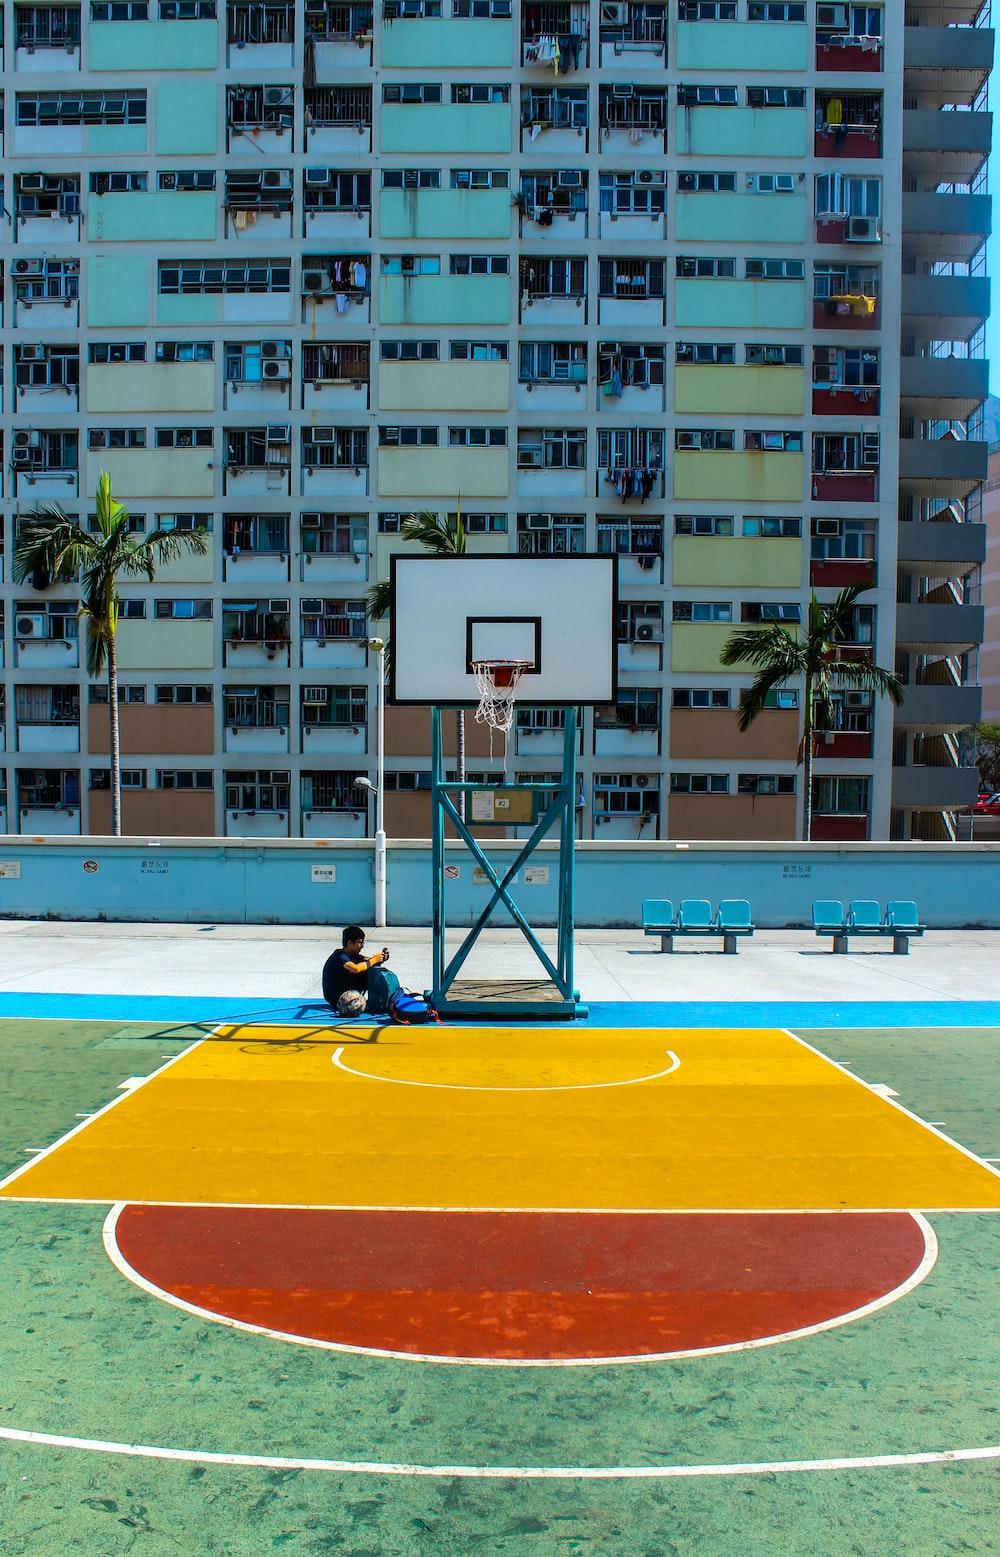 man sitting below basketball hoop near the building during daytime